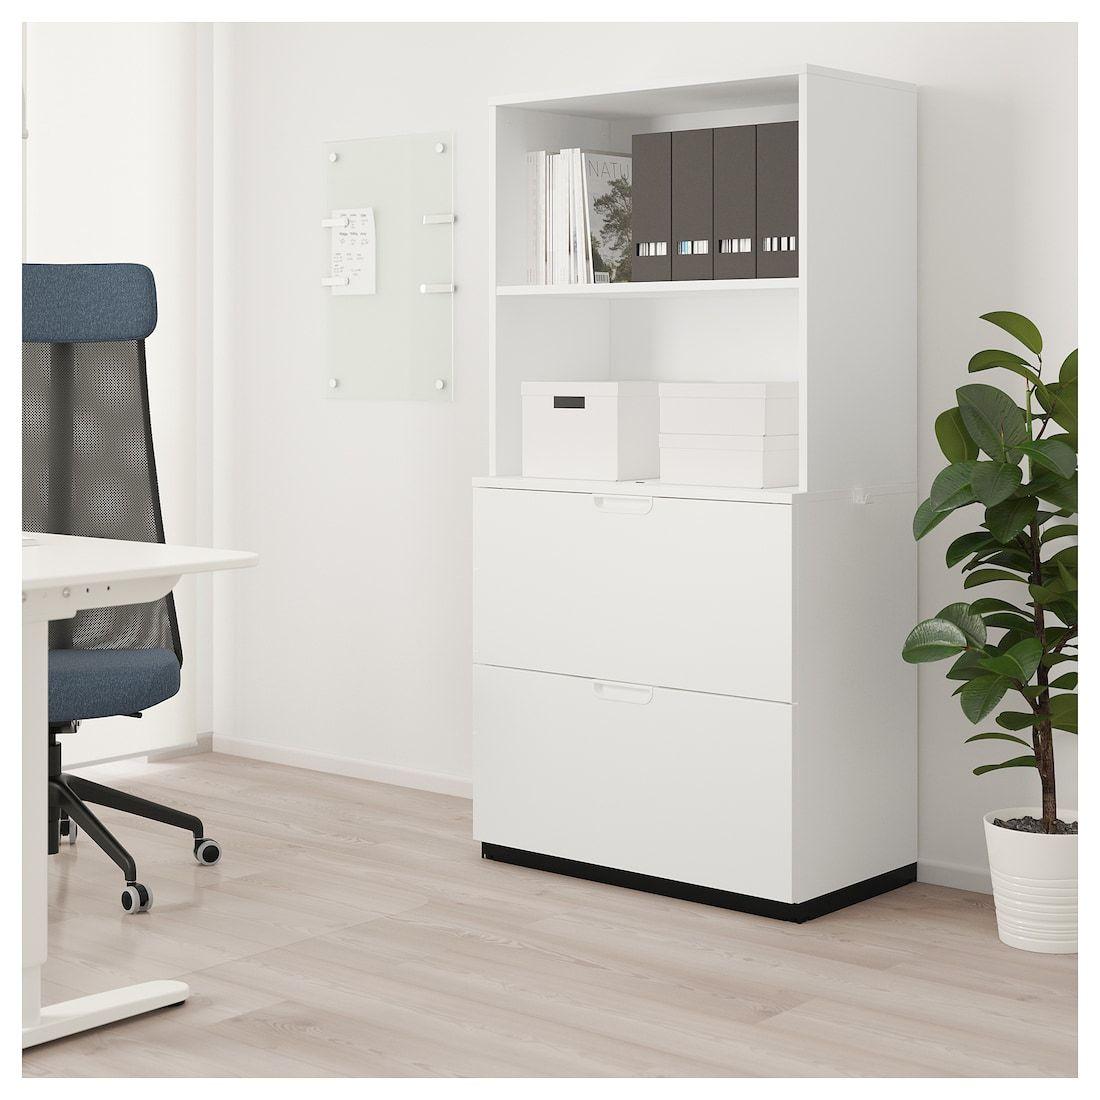 Galant Storage Combination With Filing White 31 1 2x63 Rangement Tiroir Meuble Rangement Caisson A Tiroirs